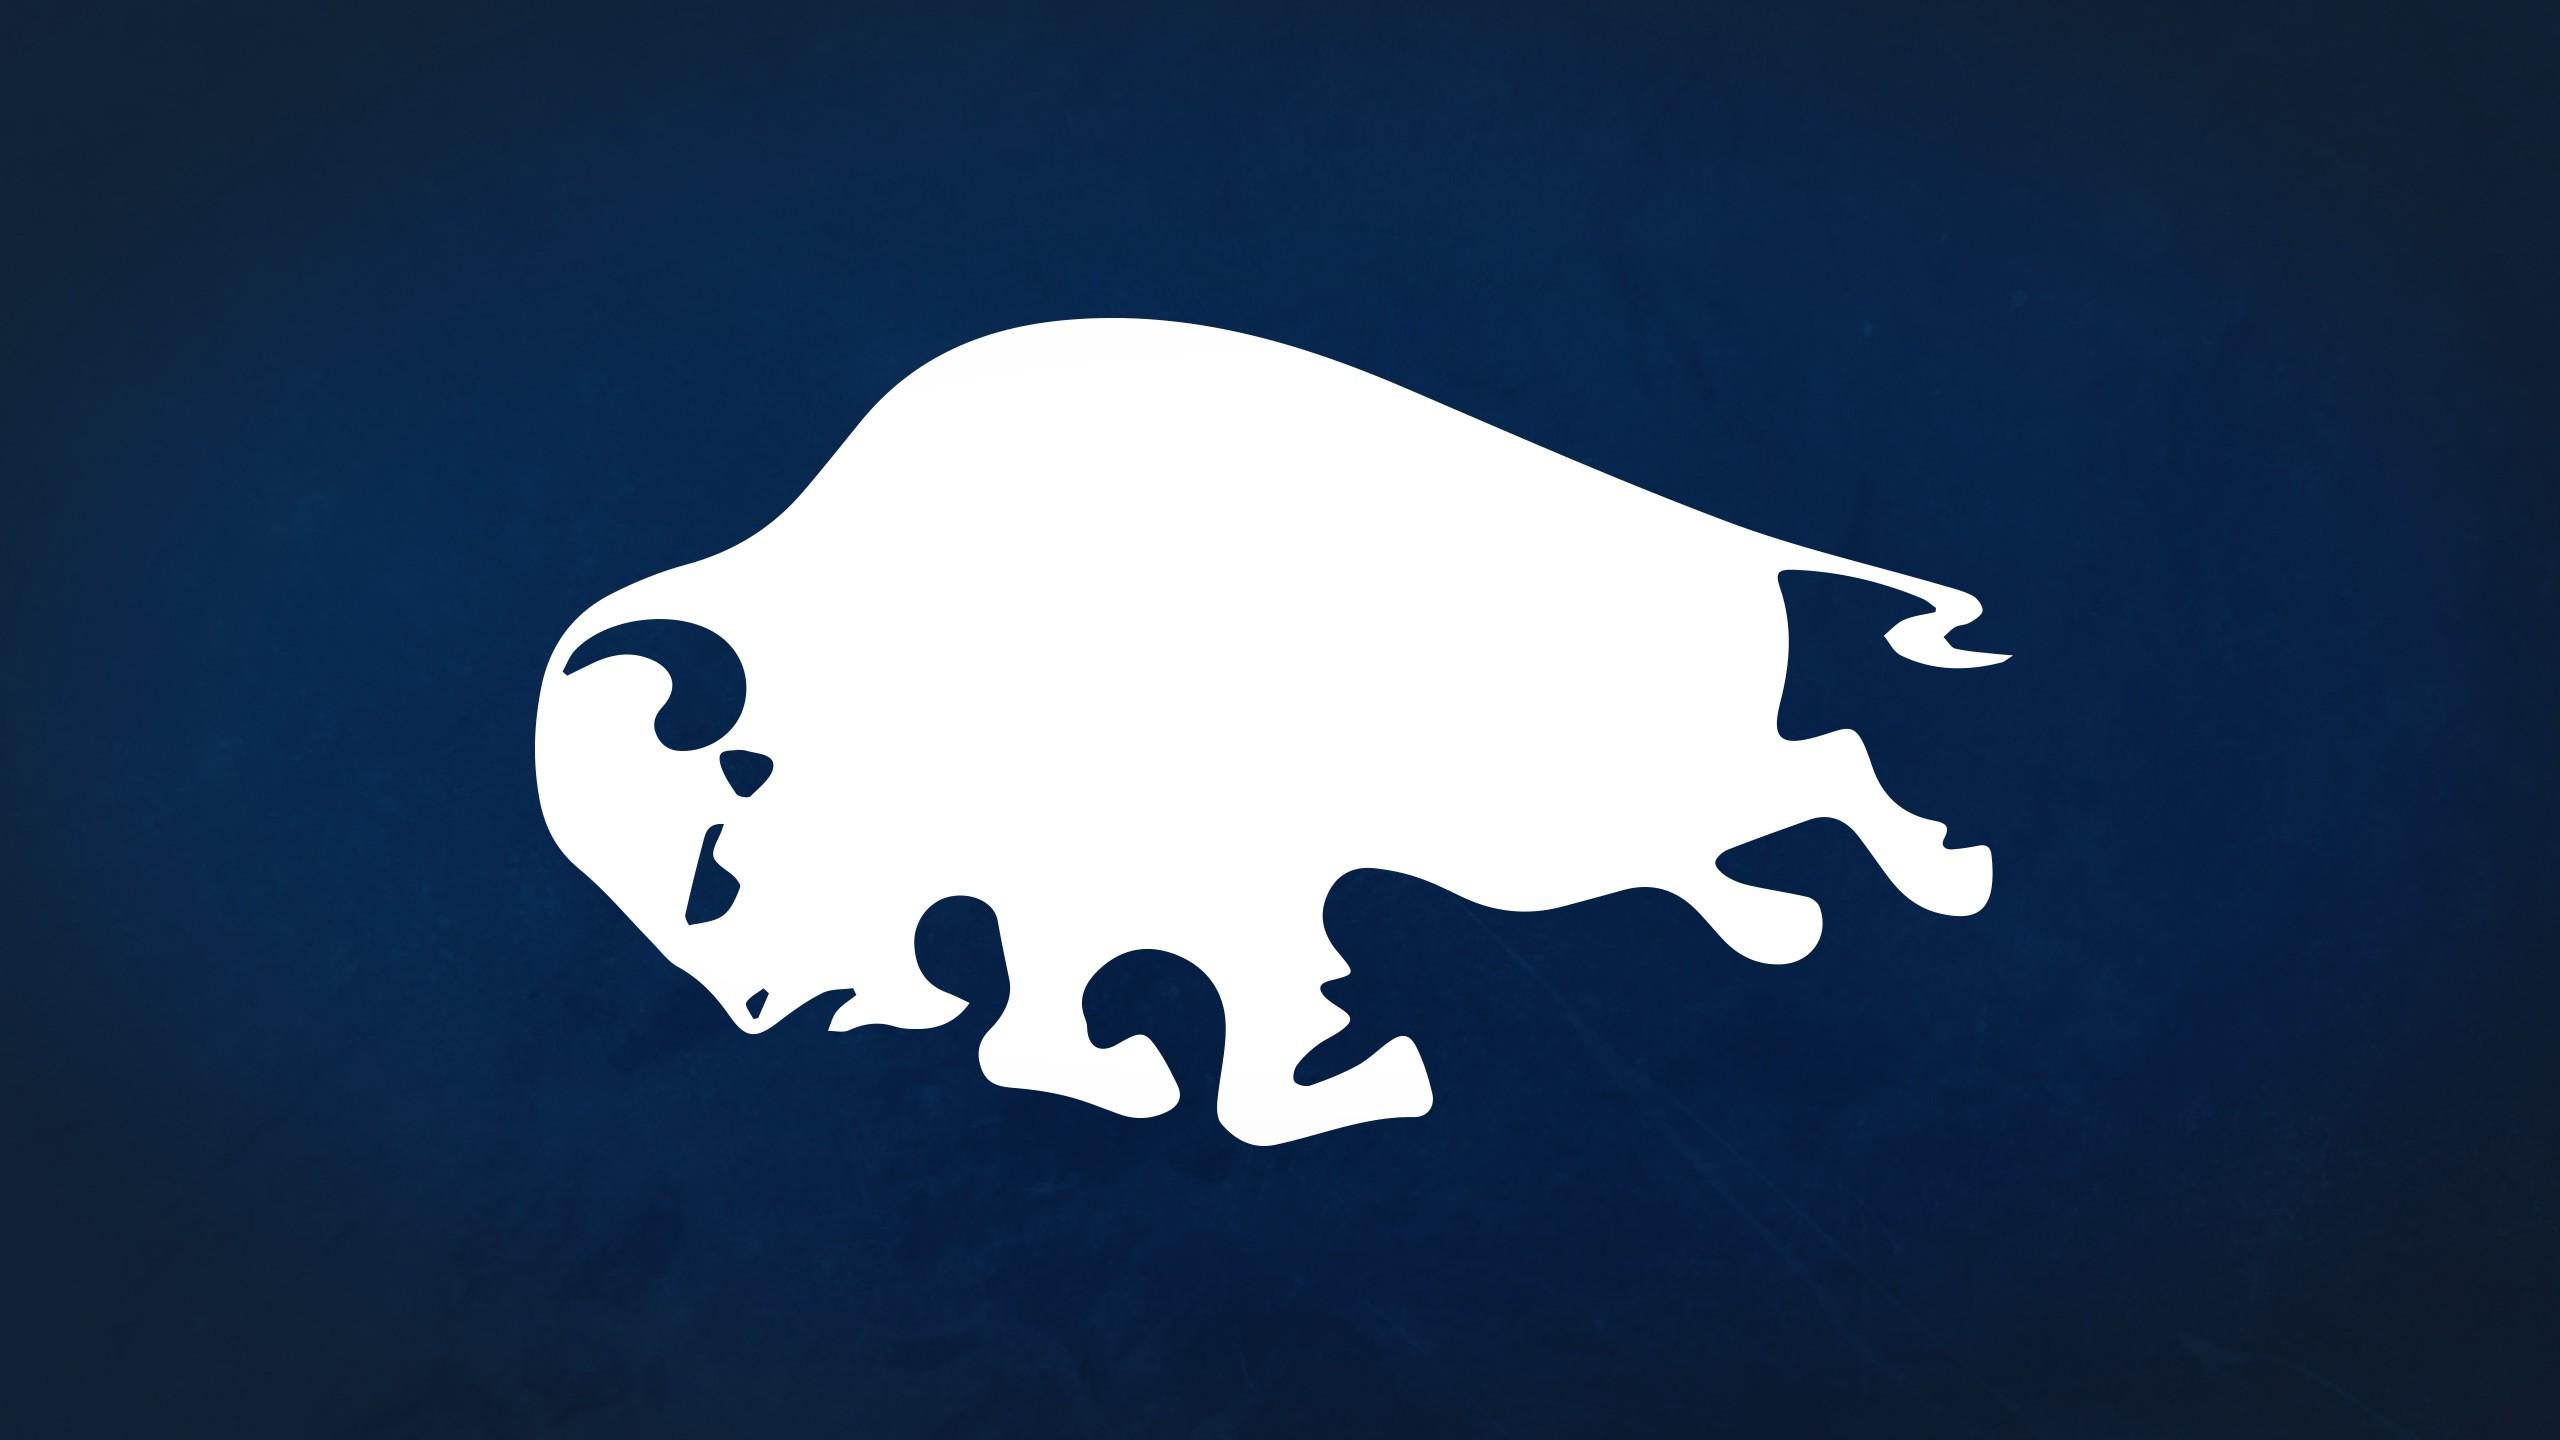 Buffalo Sabres Computer Wallpapers Desktop Backgrounds 2560x1440 2560x1440